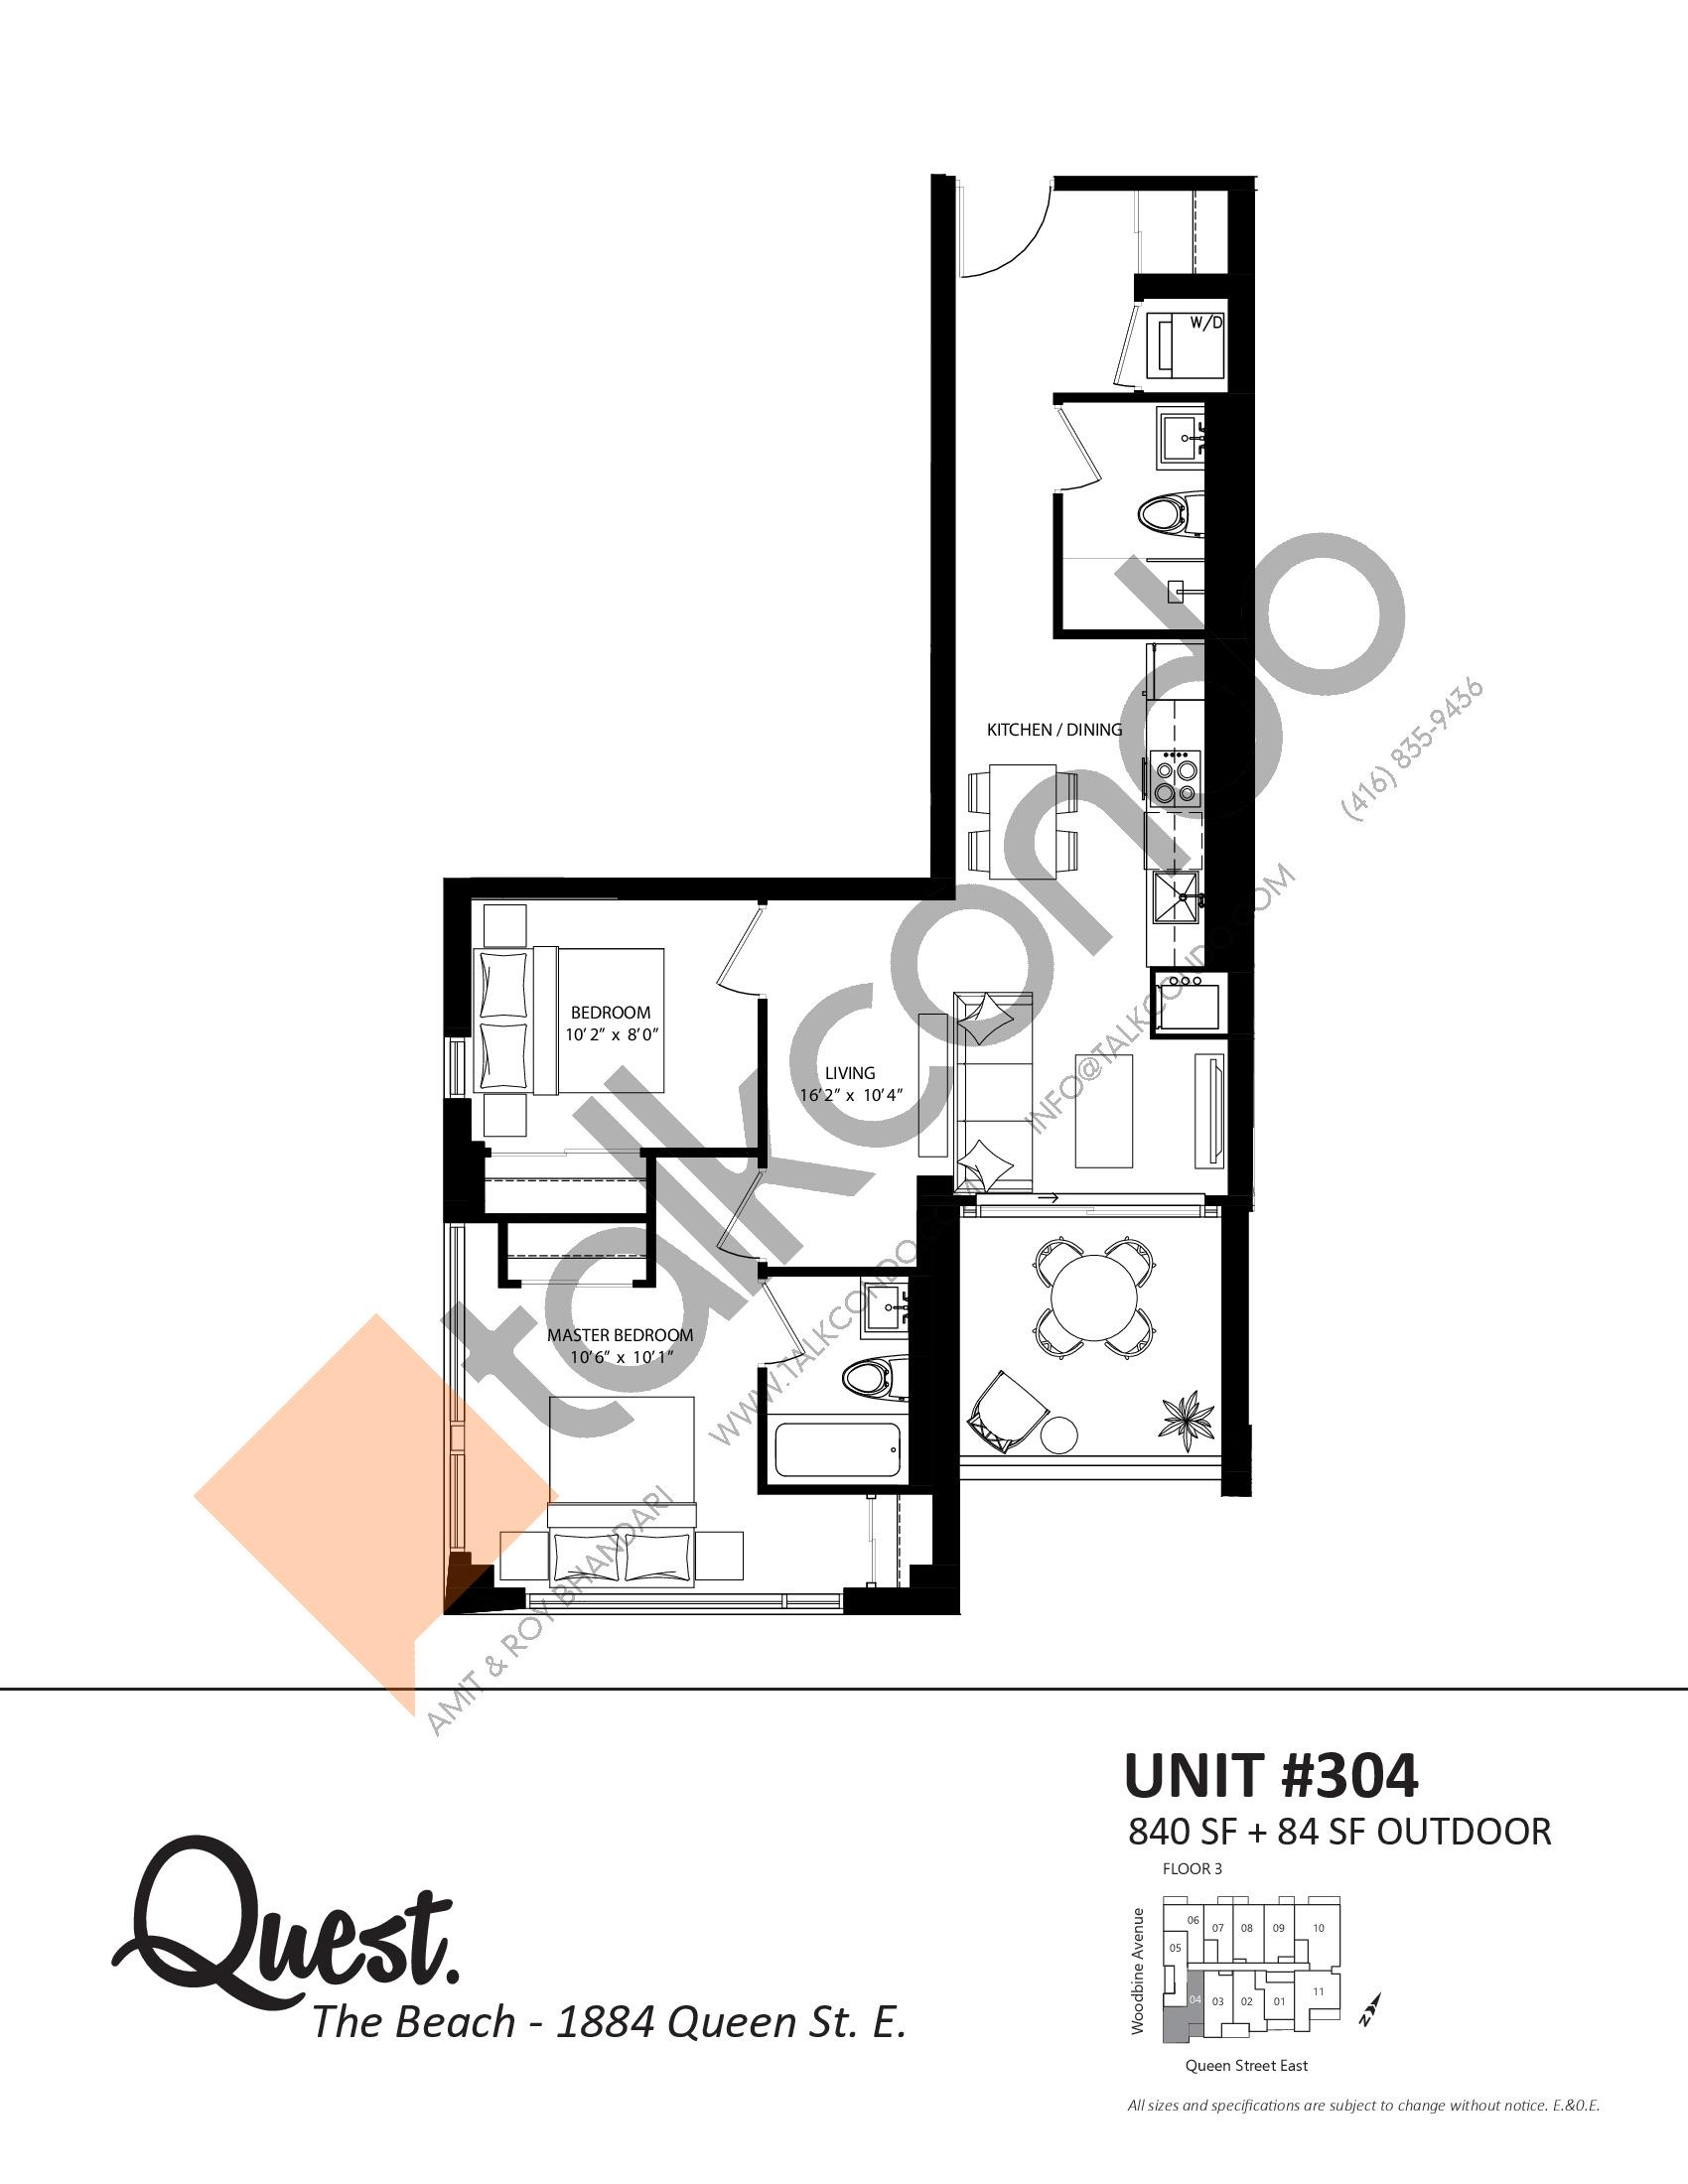 Unit 304 Floor Plan at Heartwood the Beach Condos - 840 sq.ft